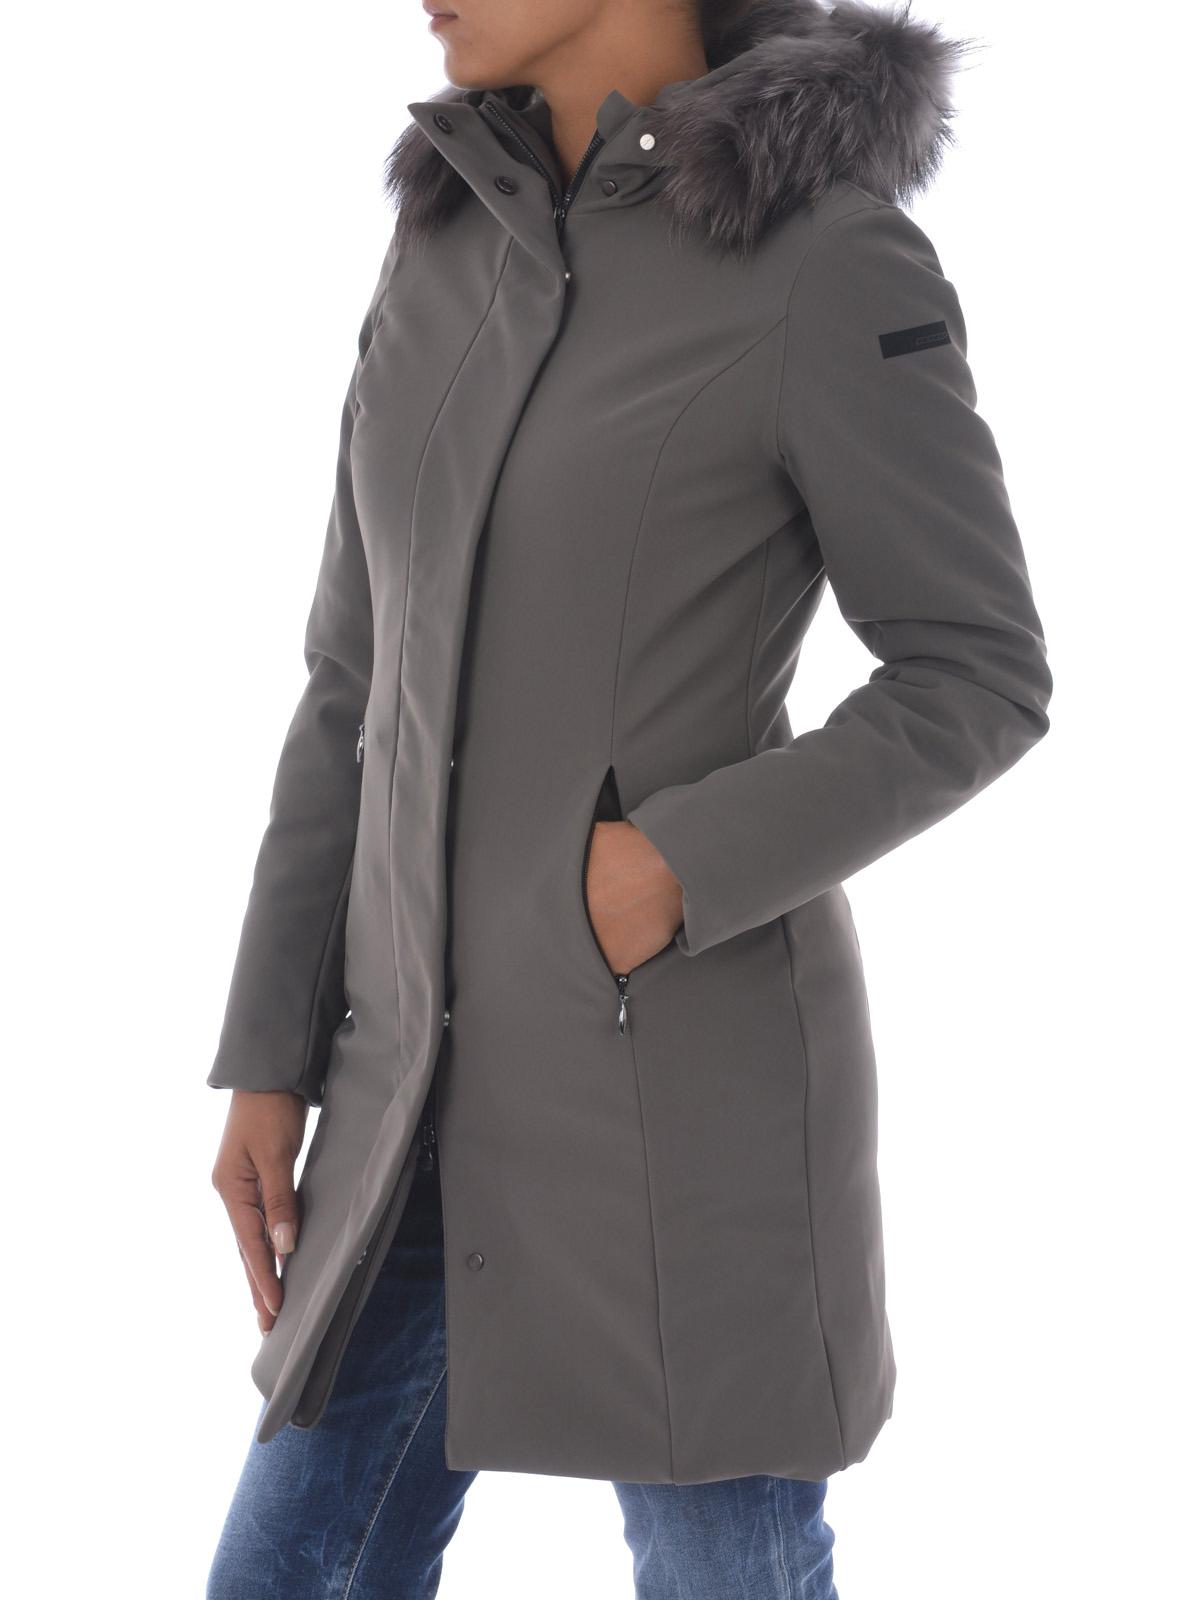 8b905e401249 RRD - Piumino Winter Long Lady Fur - cappotti imbottiti - W17501F80